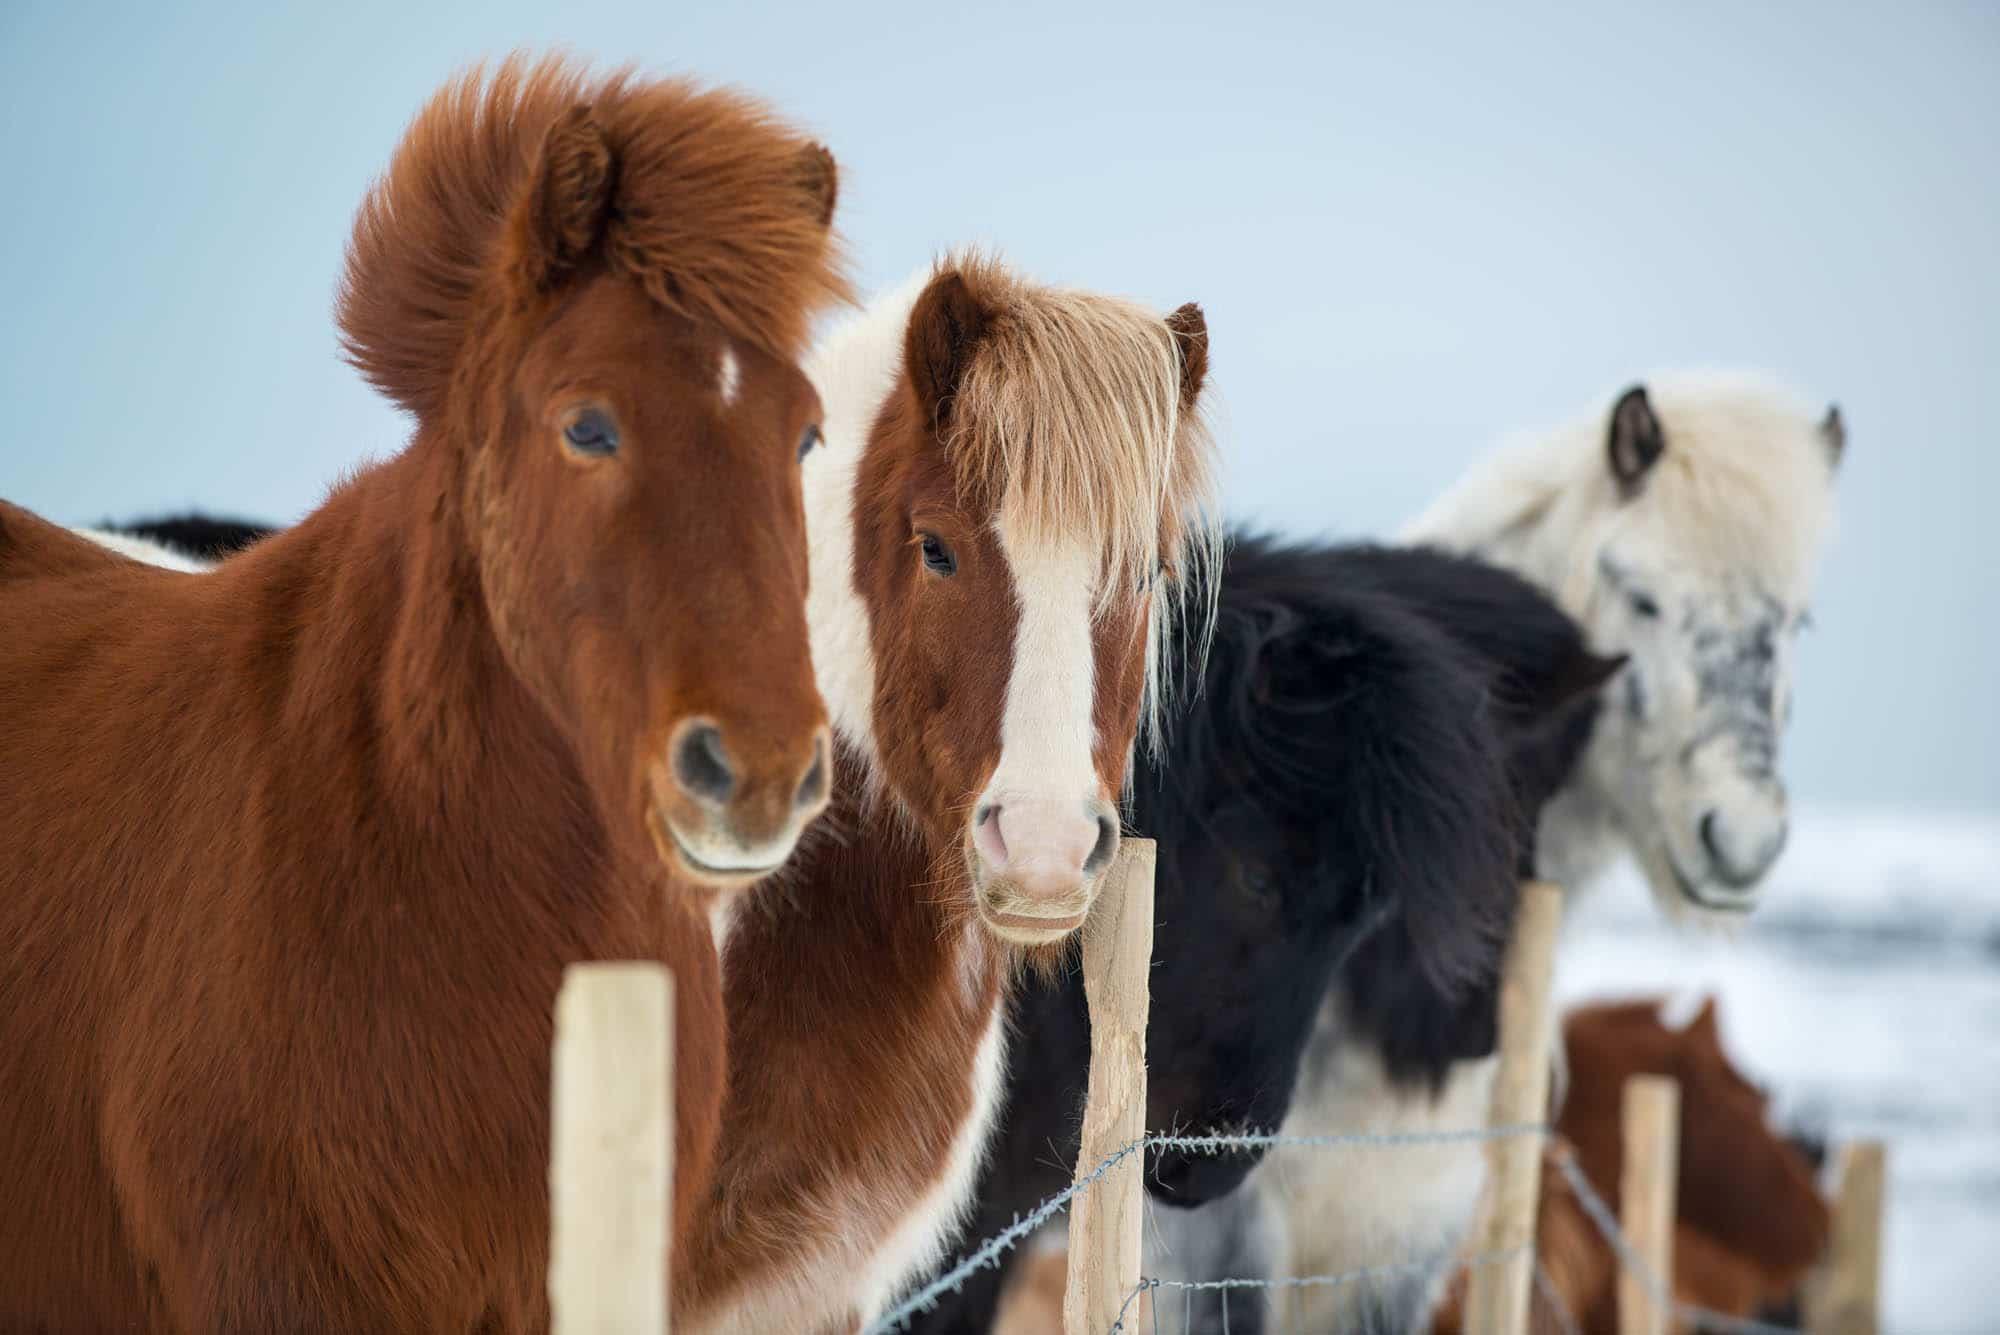 Icelandic horses in winter - Iceland family trip